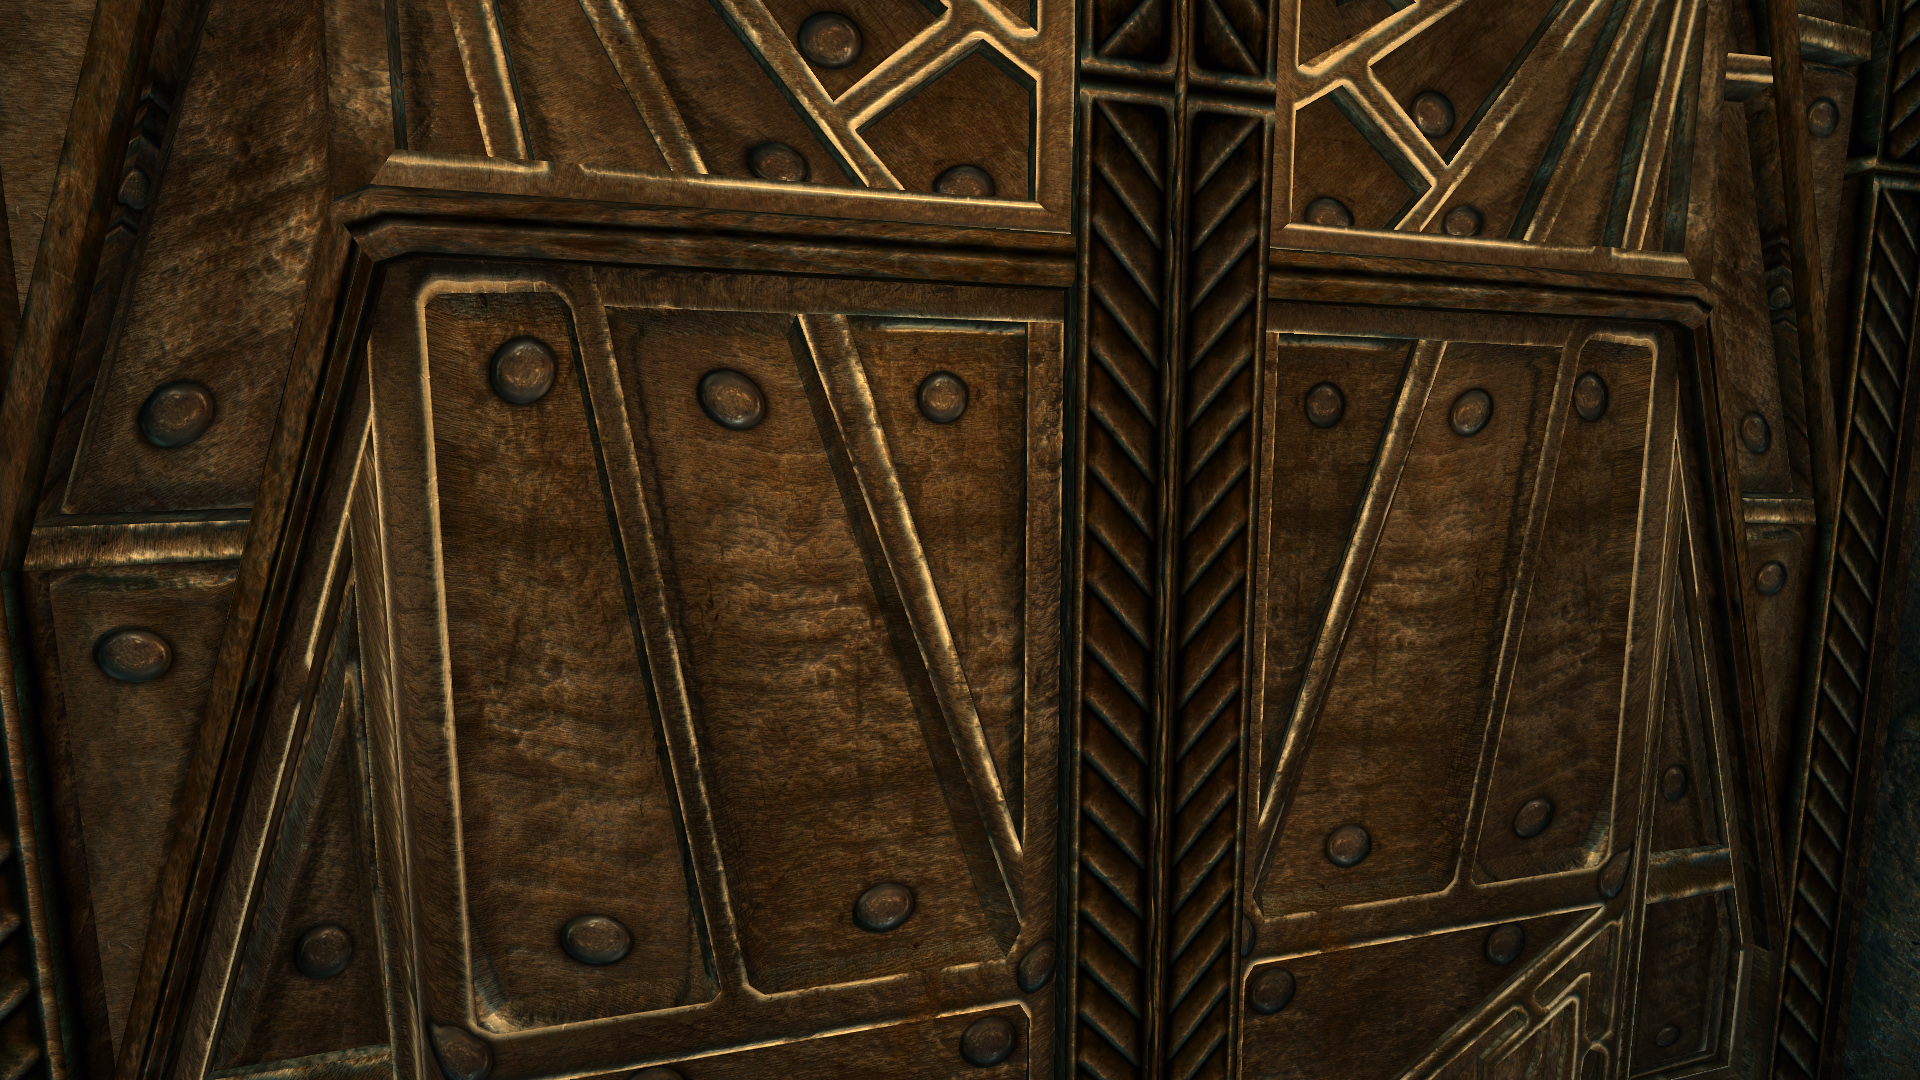 Skyrim Realistic Textures Dwemer